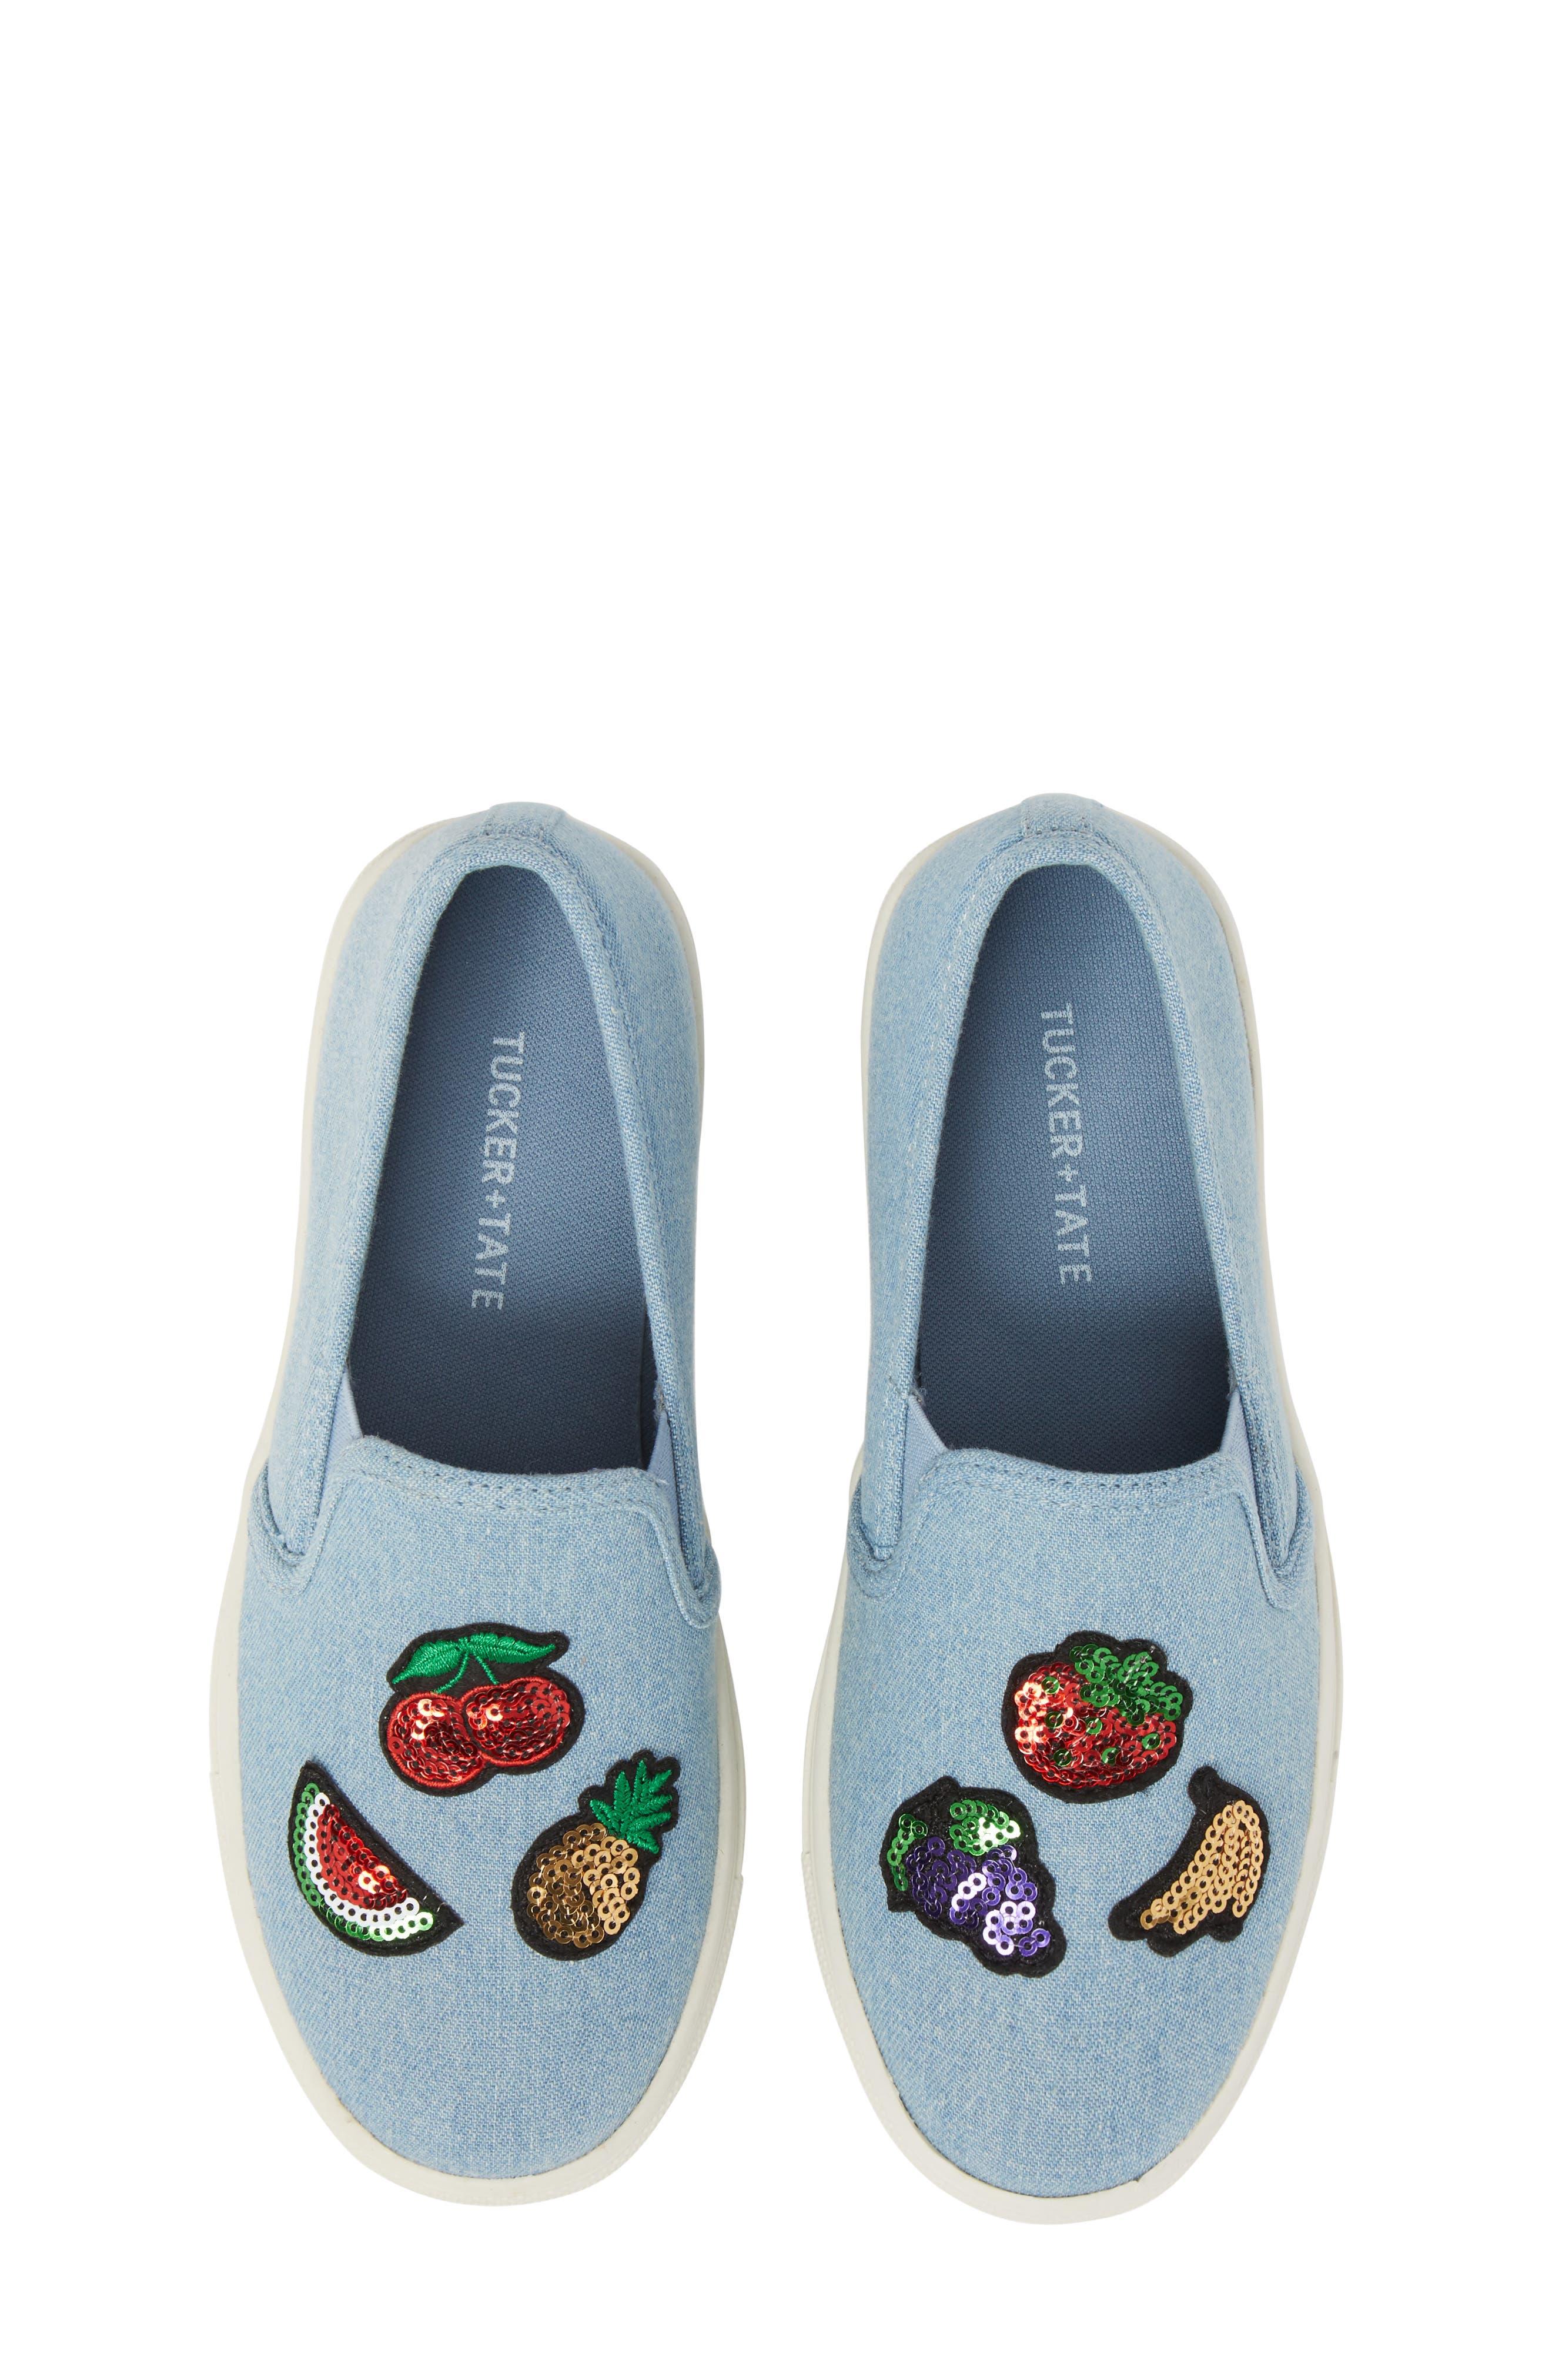 Twinny Snack Appliqué Sneaker,                         Main,                         color, Chambray Fabric